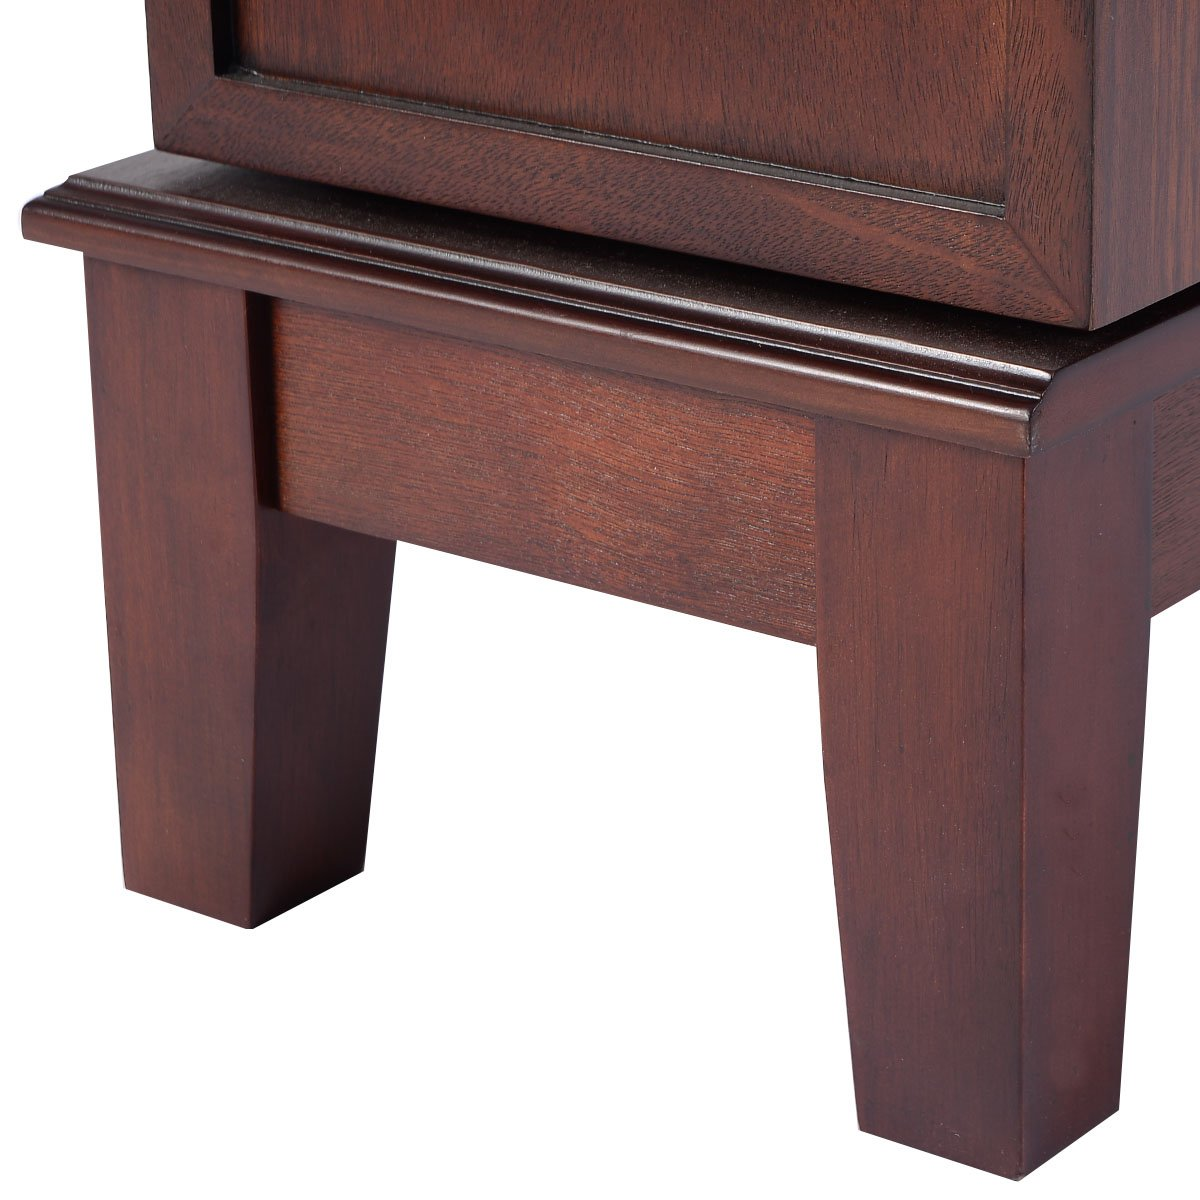 Giantex Wood Jewelry Cabinet Armoire Storage Box Chest Stand Organizer Necklace